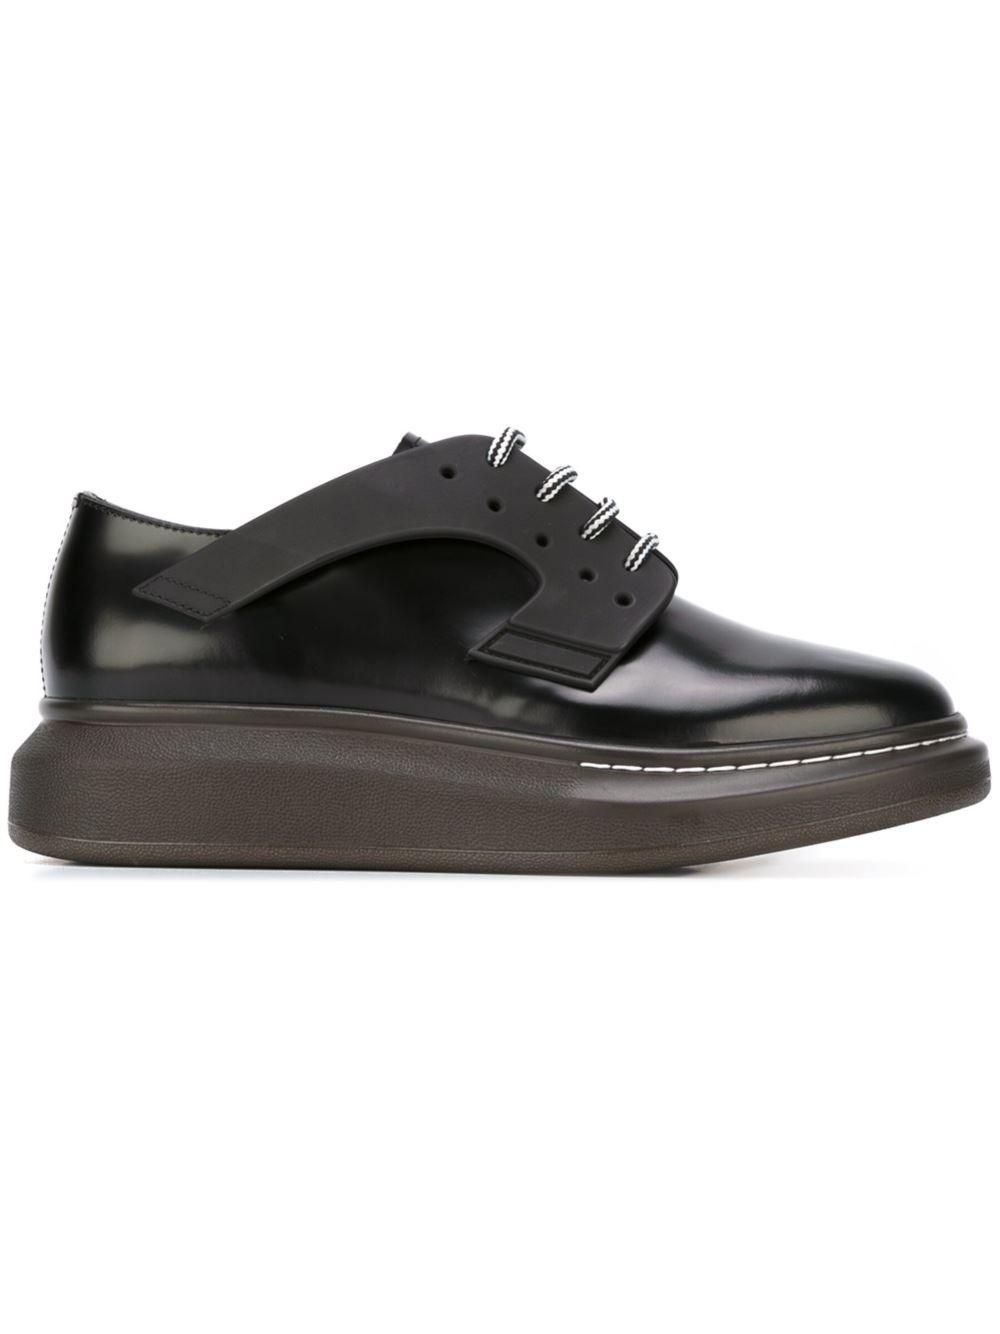 best website 0b89f c8d45 Alexander McQueen zapatos Derby con suela gruesa